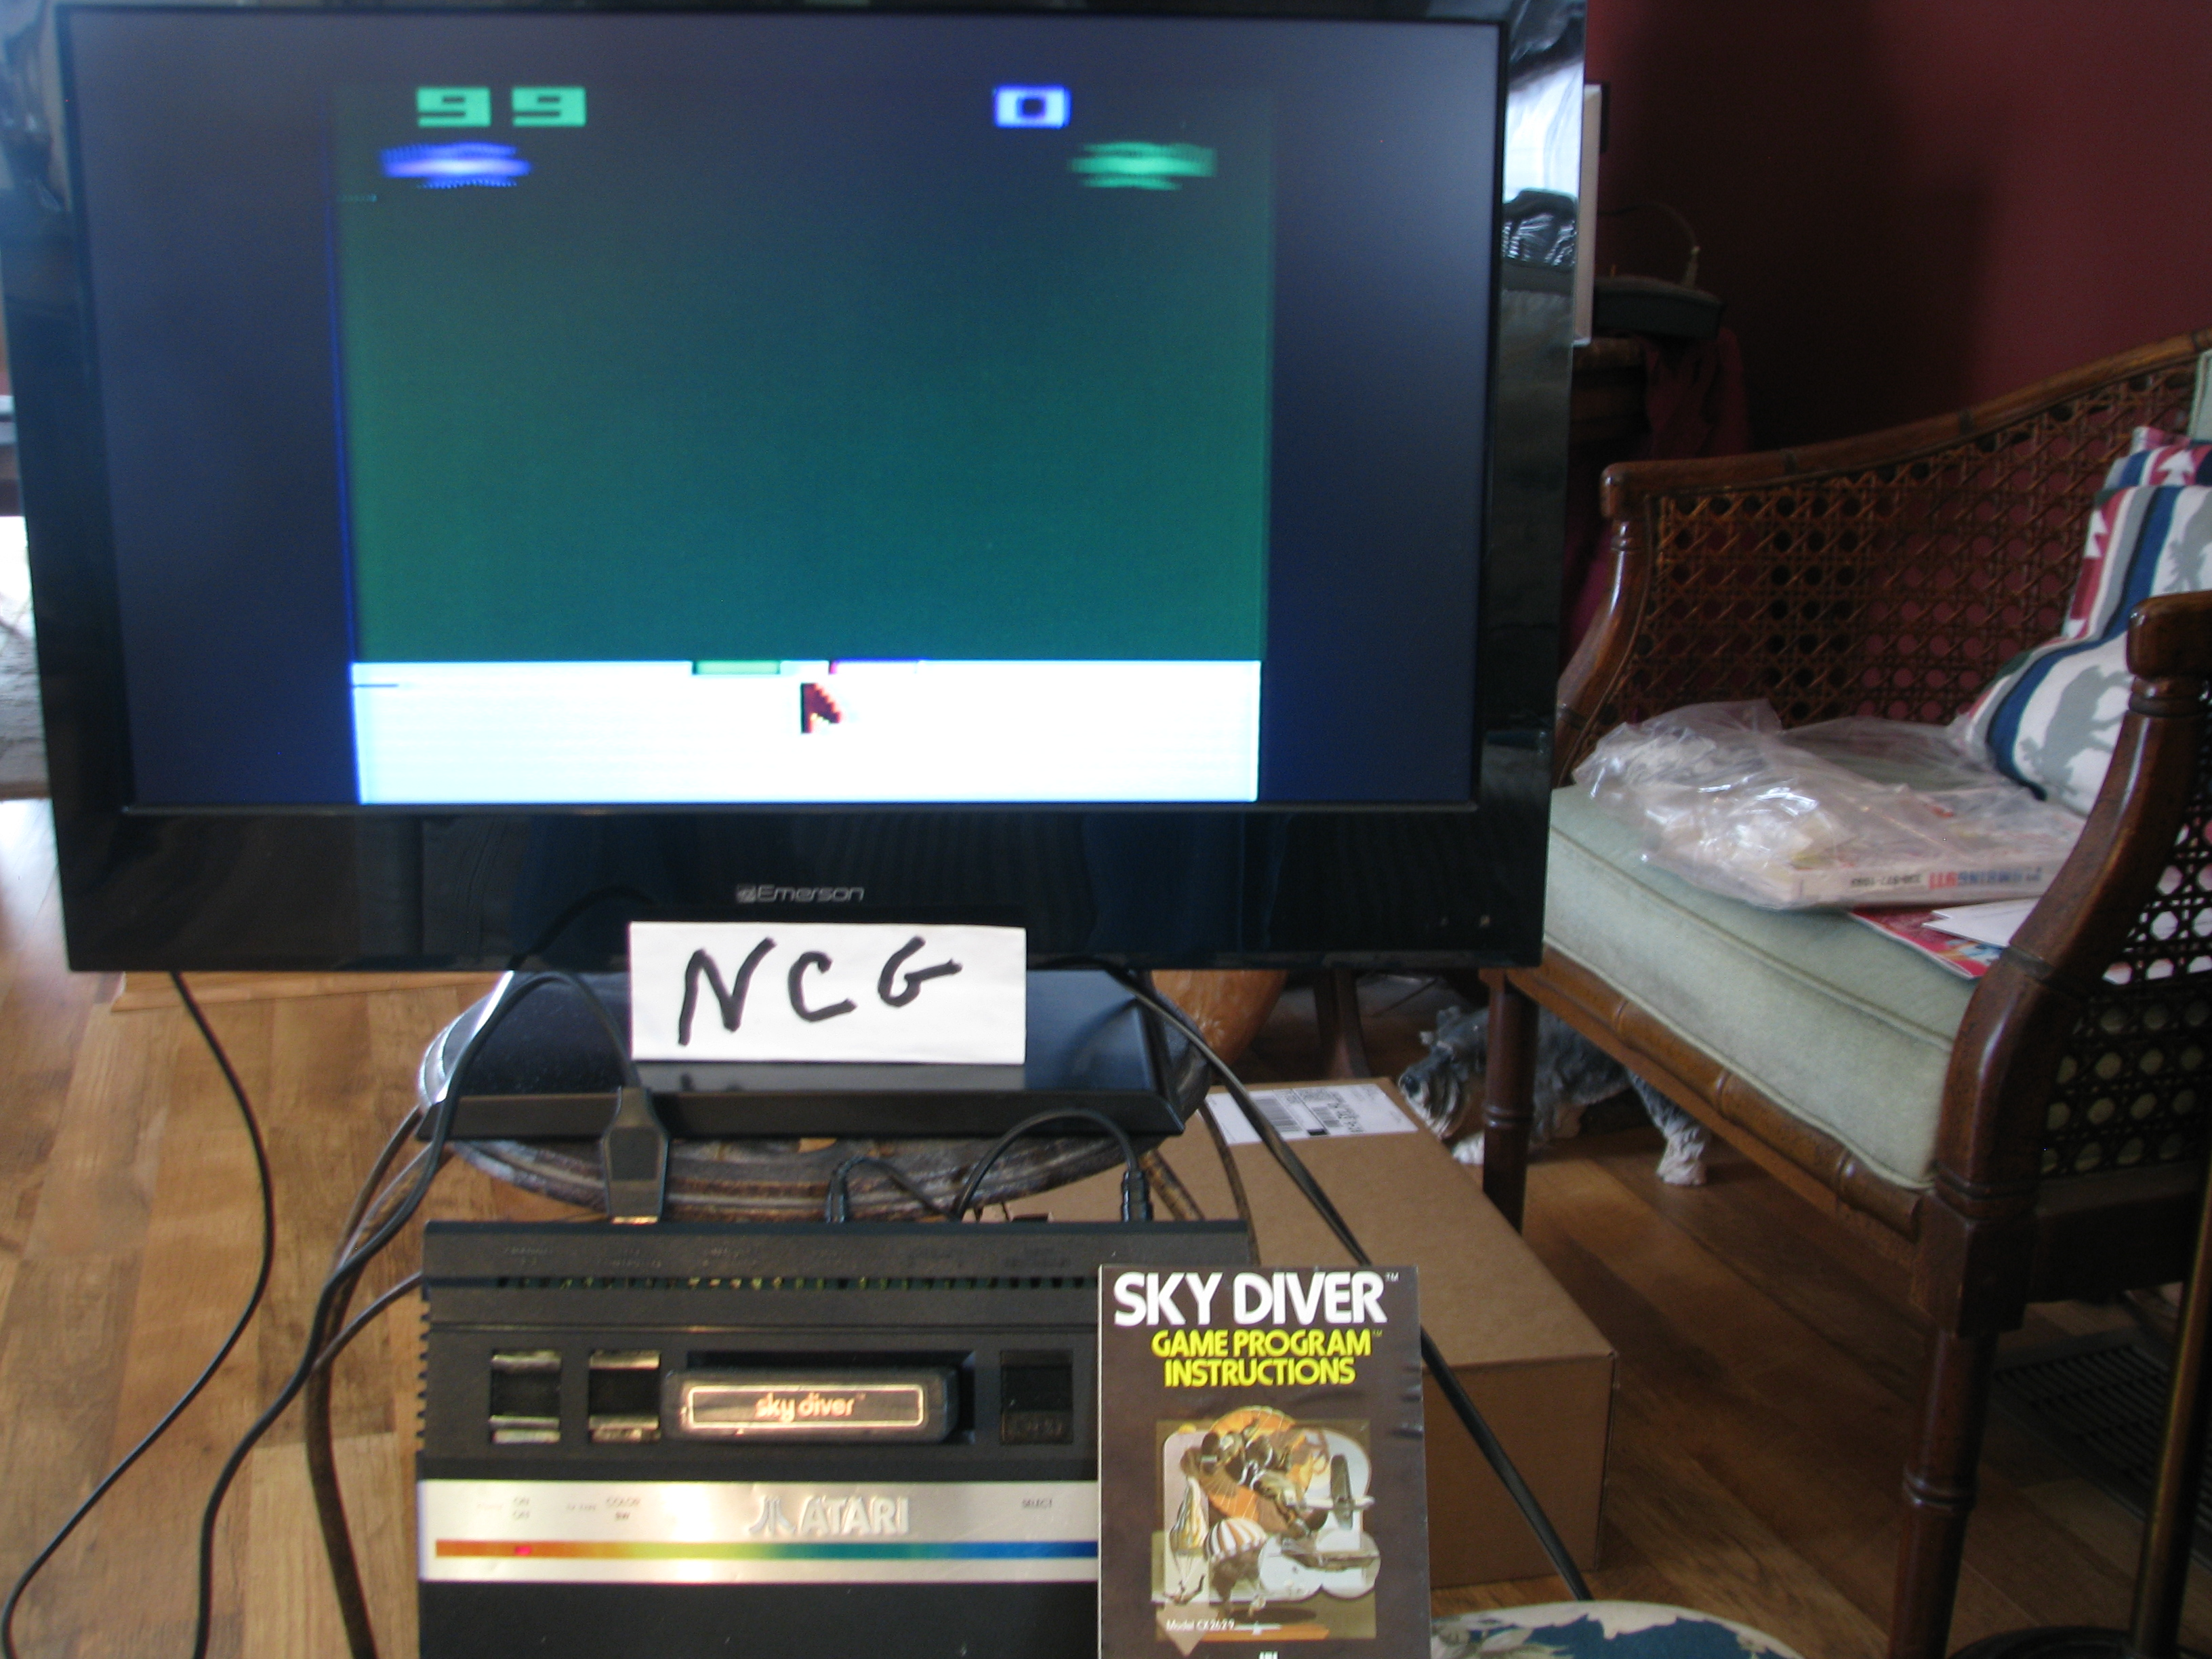 NorthCoastGamer: Sky Diver (Atari 2600 Novice/B) 99 points on 2015-01-10 15:03:47